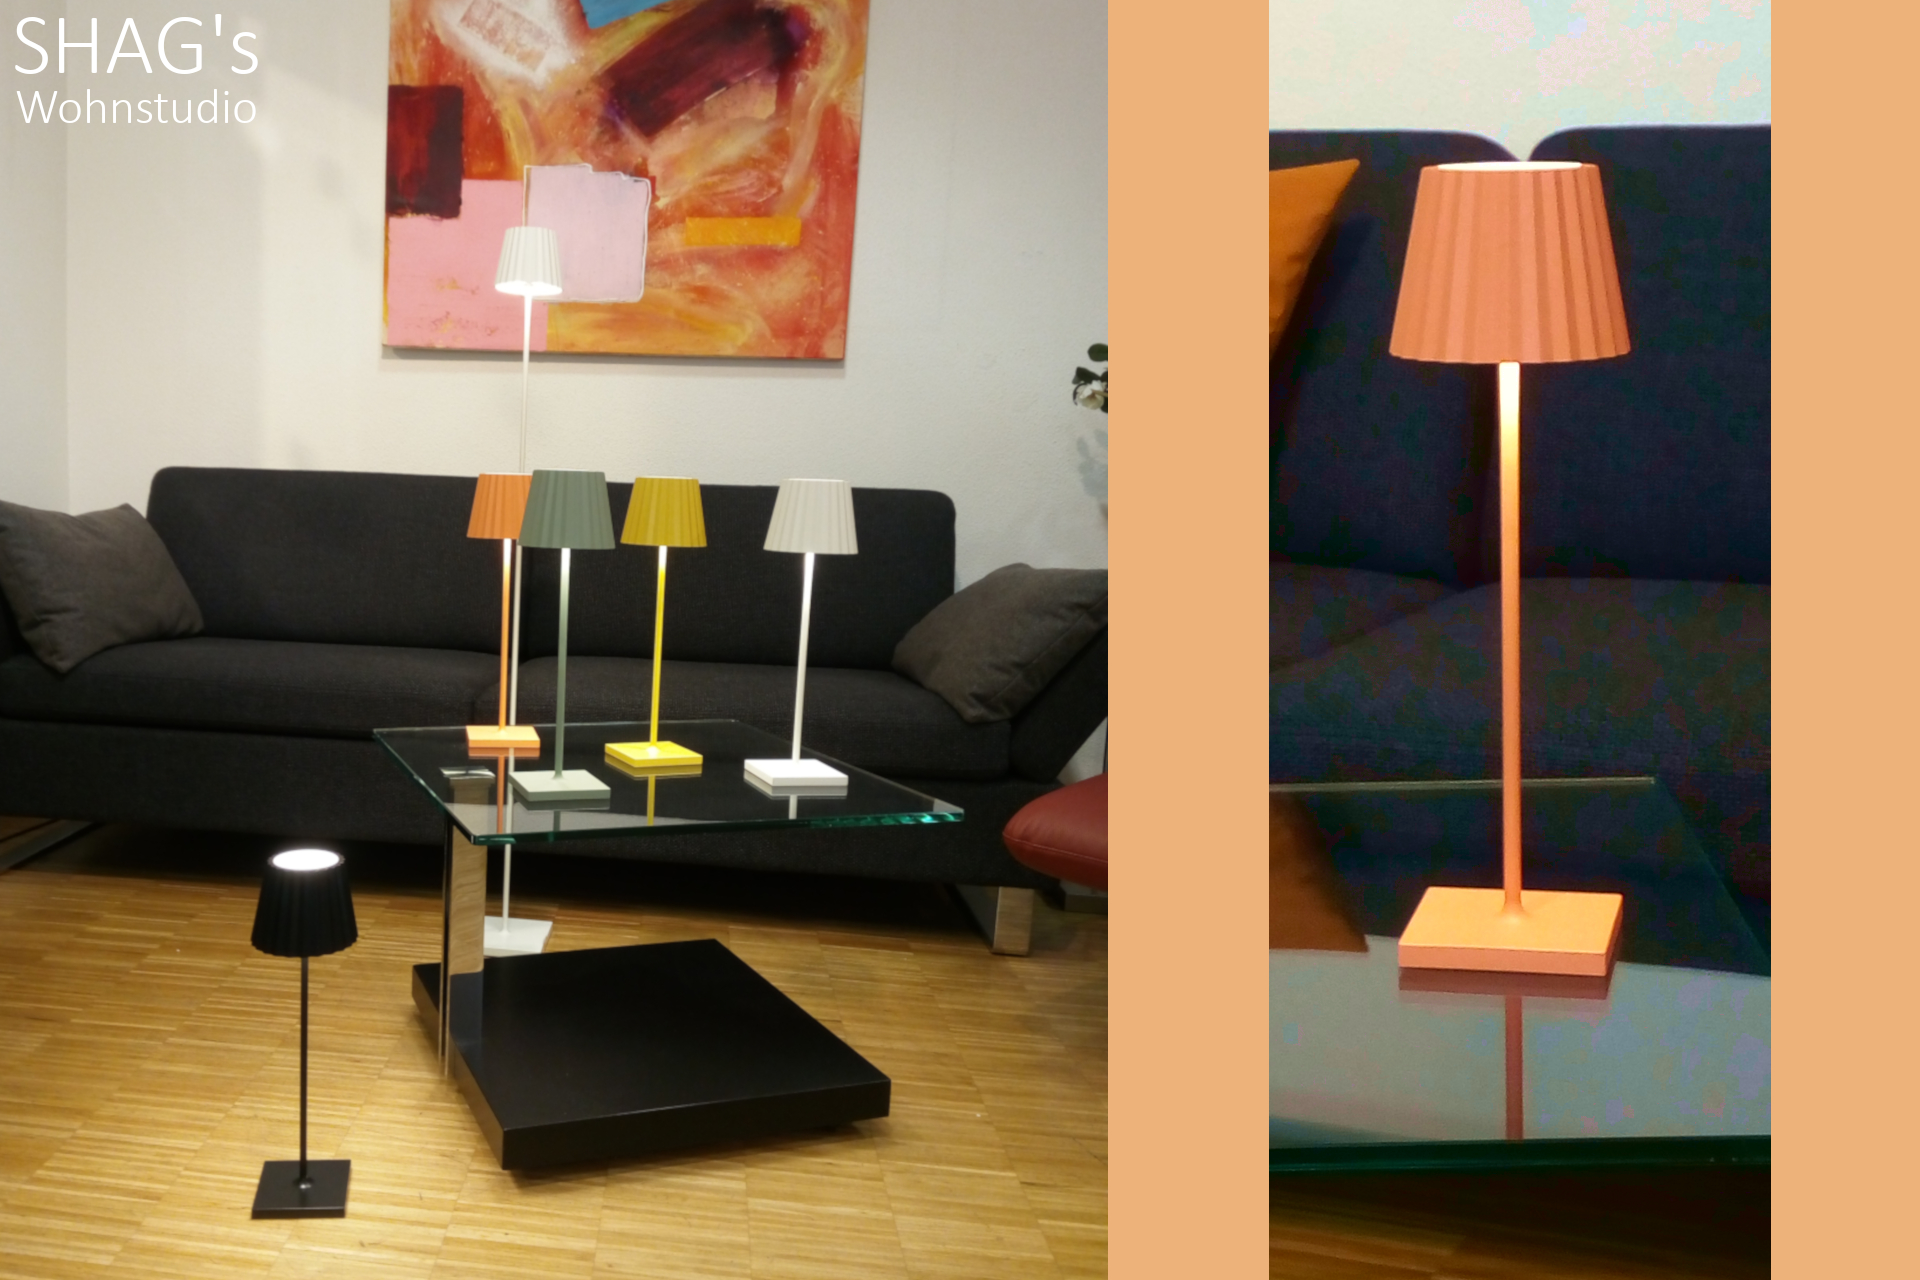 SHAGs Wohnstudio Funktionssofas Schlafcouchen Eckgruppen Sessel Living Interior Lampen LED Leuchten Beleuchtung